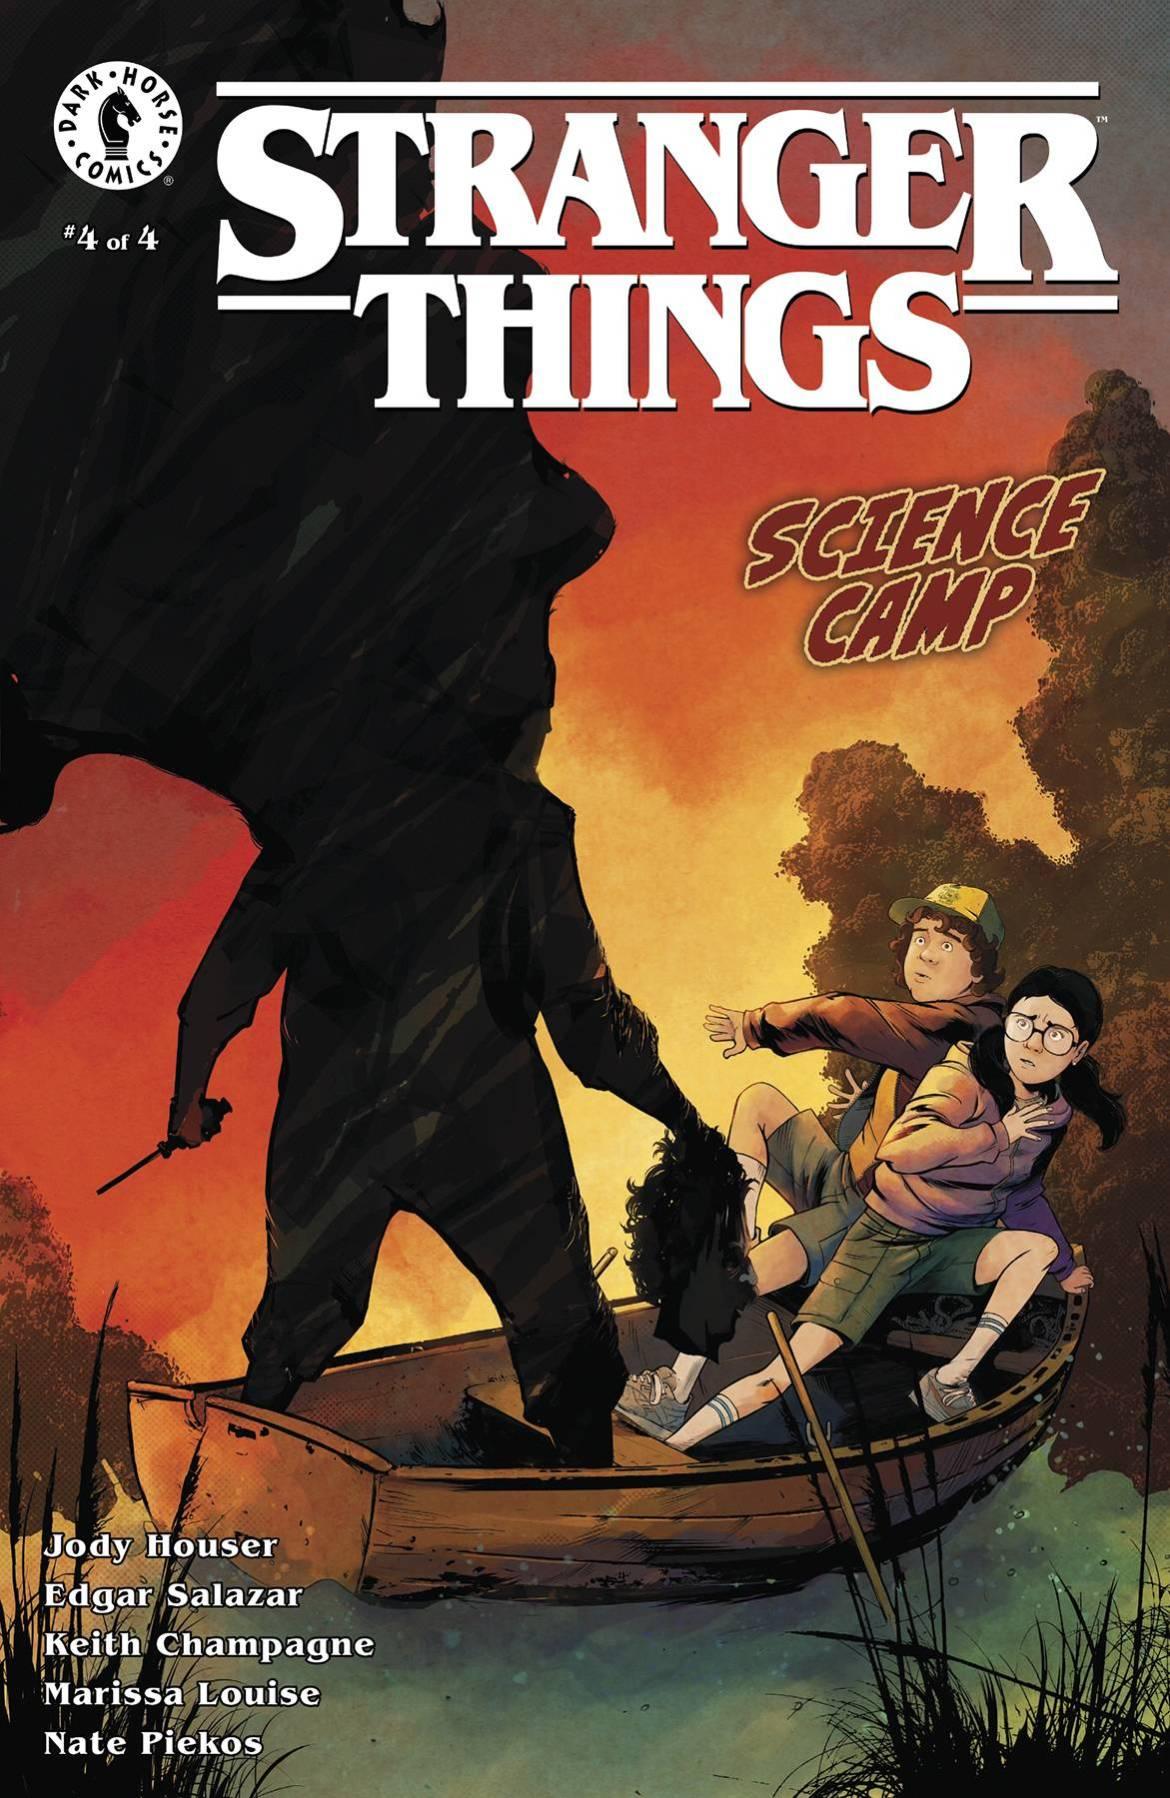 STL170927 ComicList: Dark Horse Comics New Releases for 01/13/2021